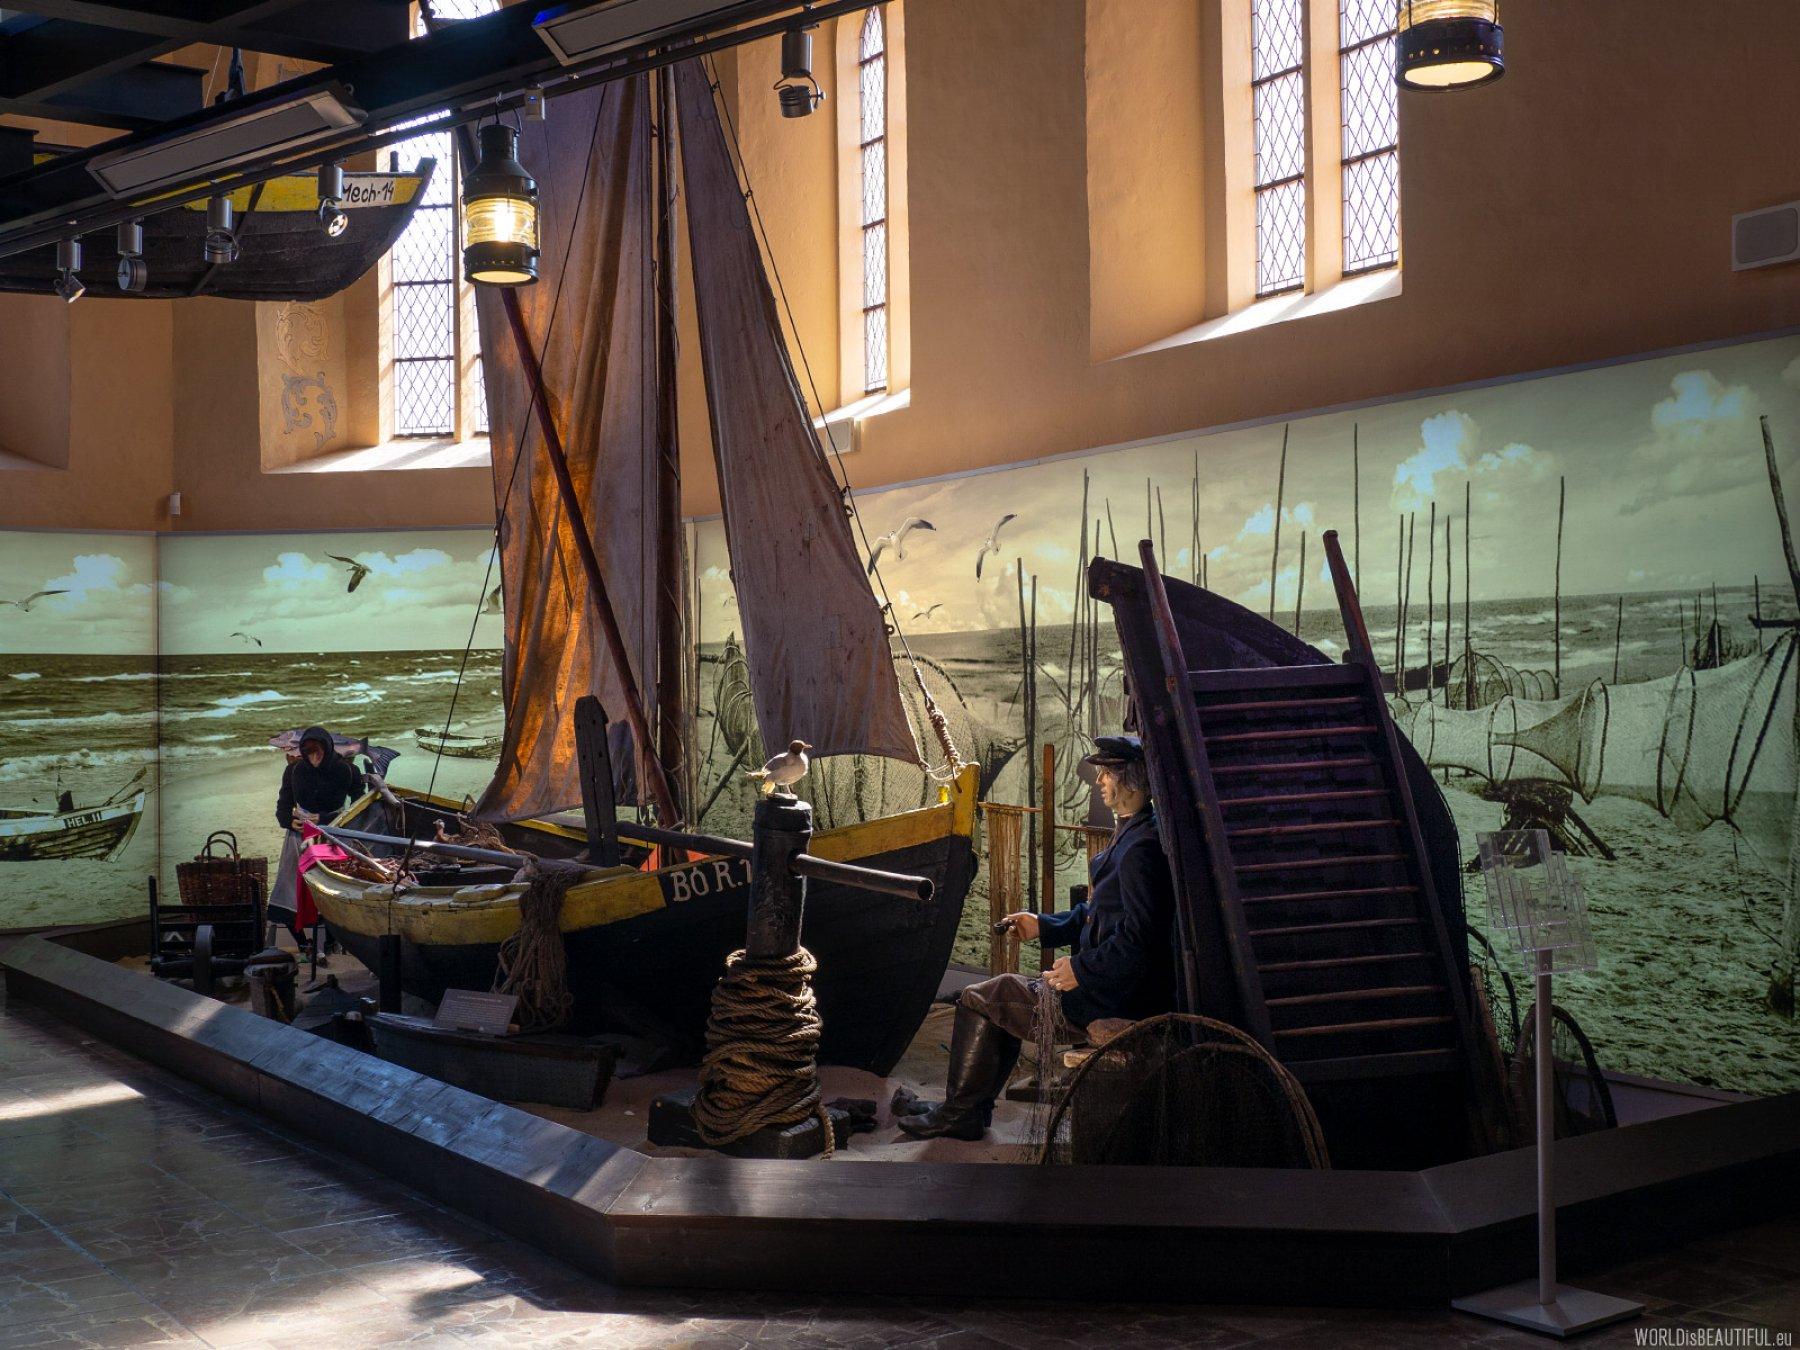 The Fisheries Museum in Hel